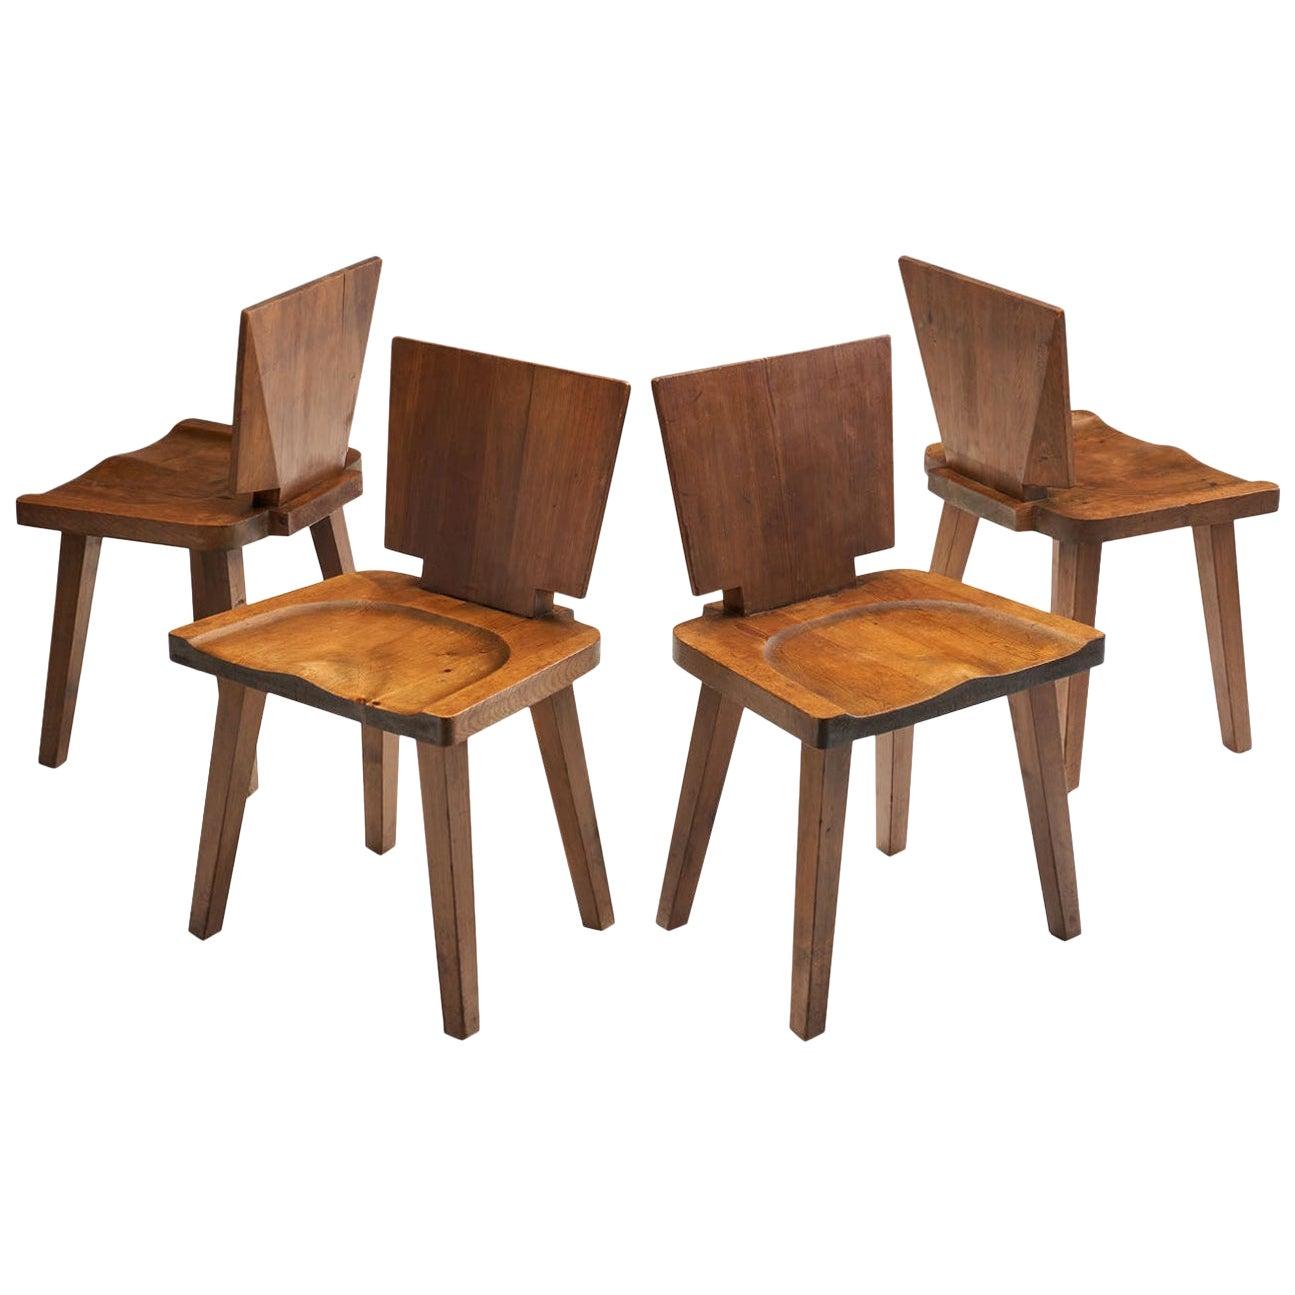 Set of Four Brutalist Pine Chairs, Scandinavia, circa 1950s